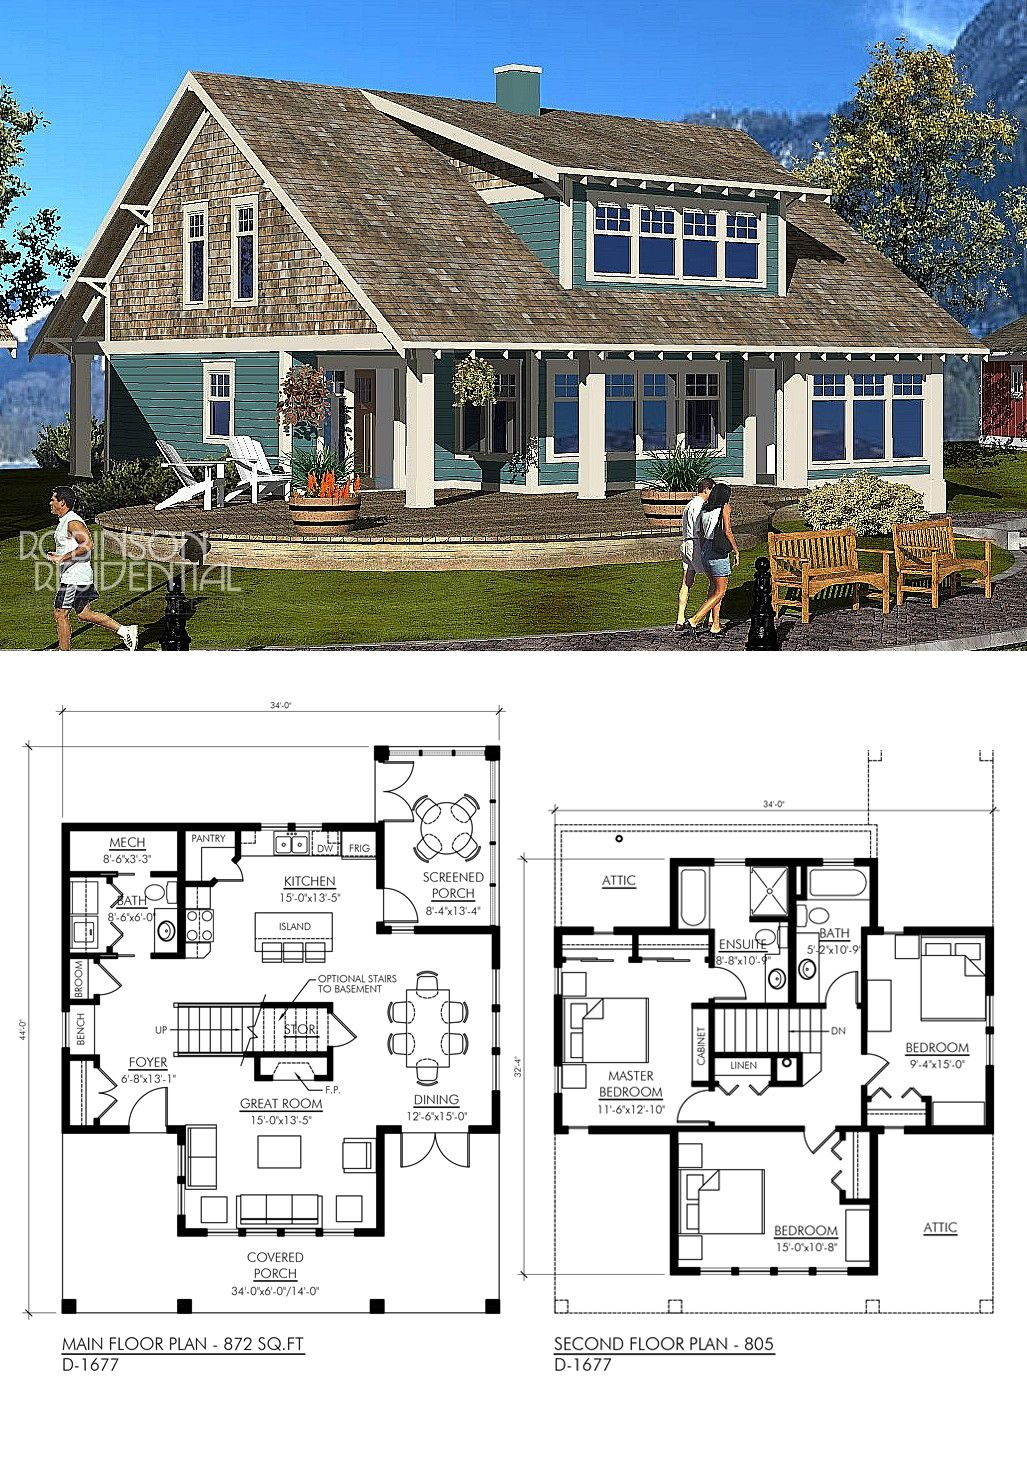 Craftsman D 1677 Robinson Plans Lake House Plans House Plan Gallery Cottage Floor Plans